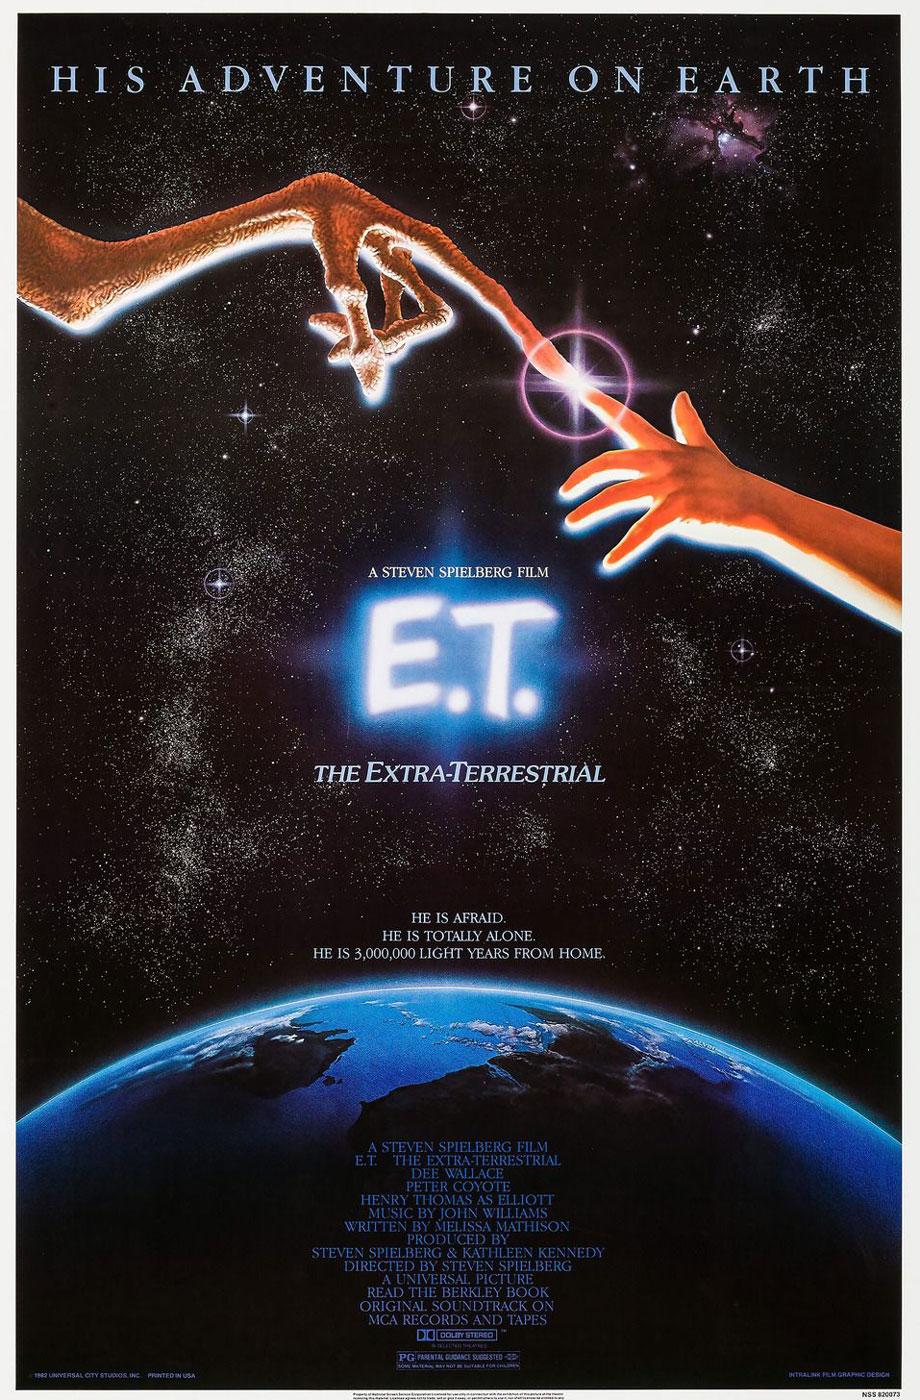 E.T. the Extra-Terrestrial - Steven Spielberg (1982)